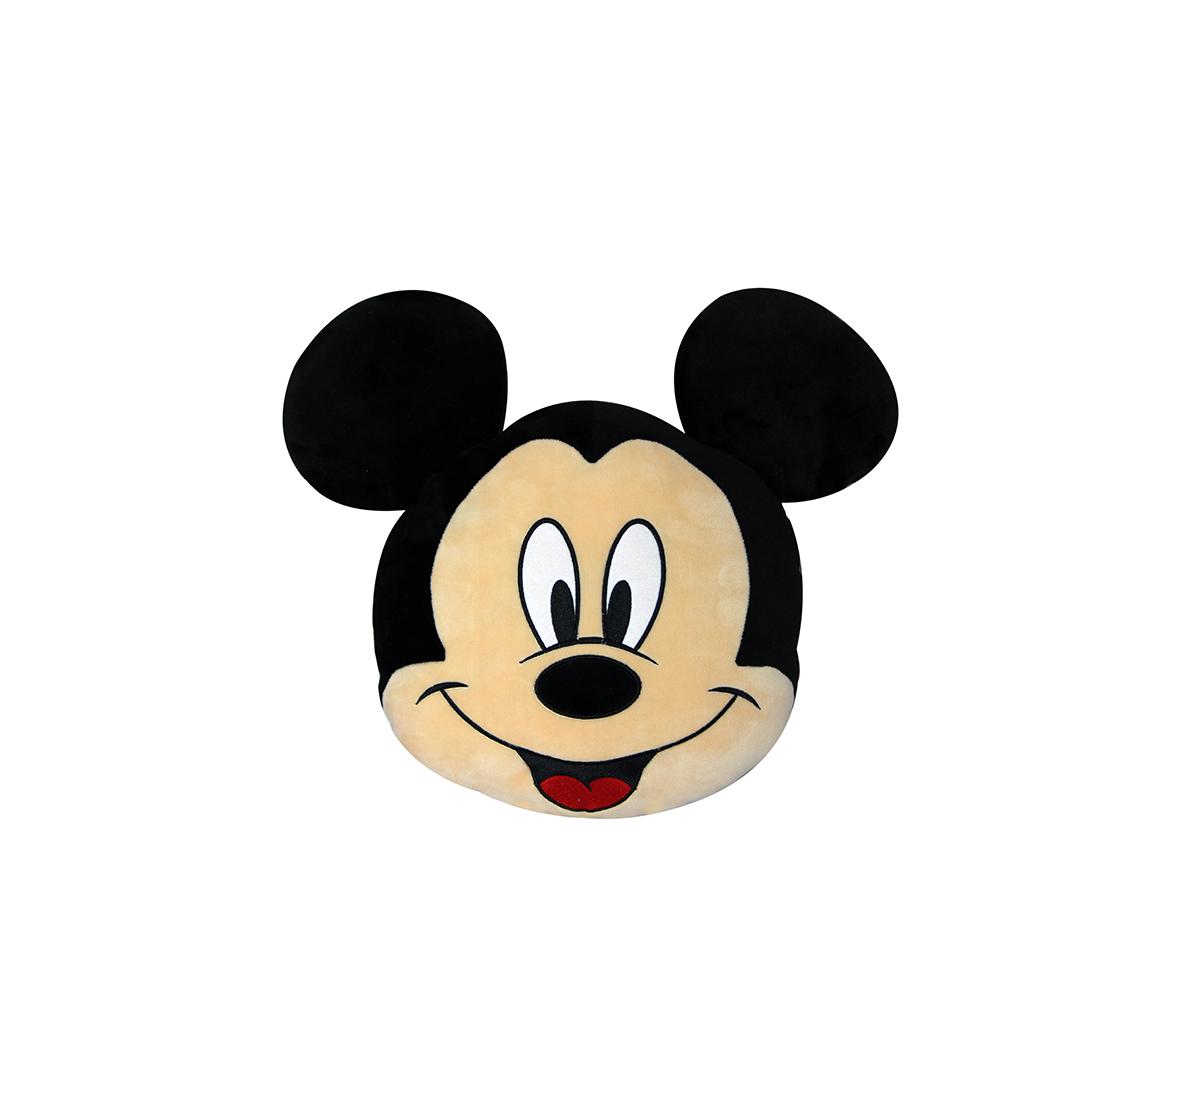 Disney | Disney 2Side Micky Minie Shape Cush Plush Accessories for Kids age 12M+ - 30.48 Cm